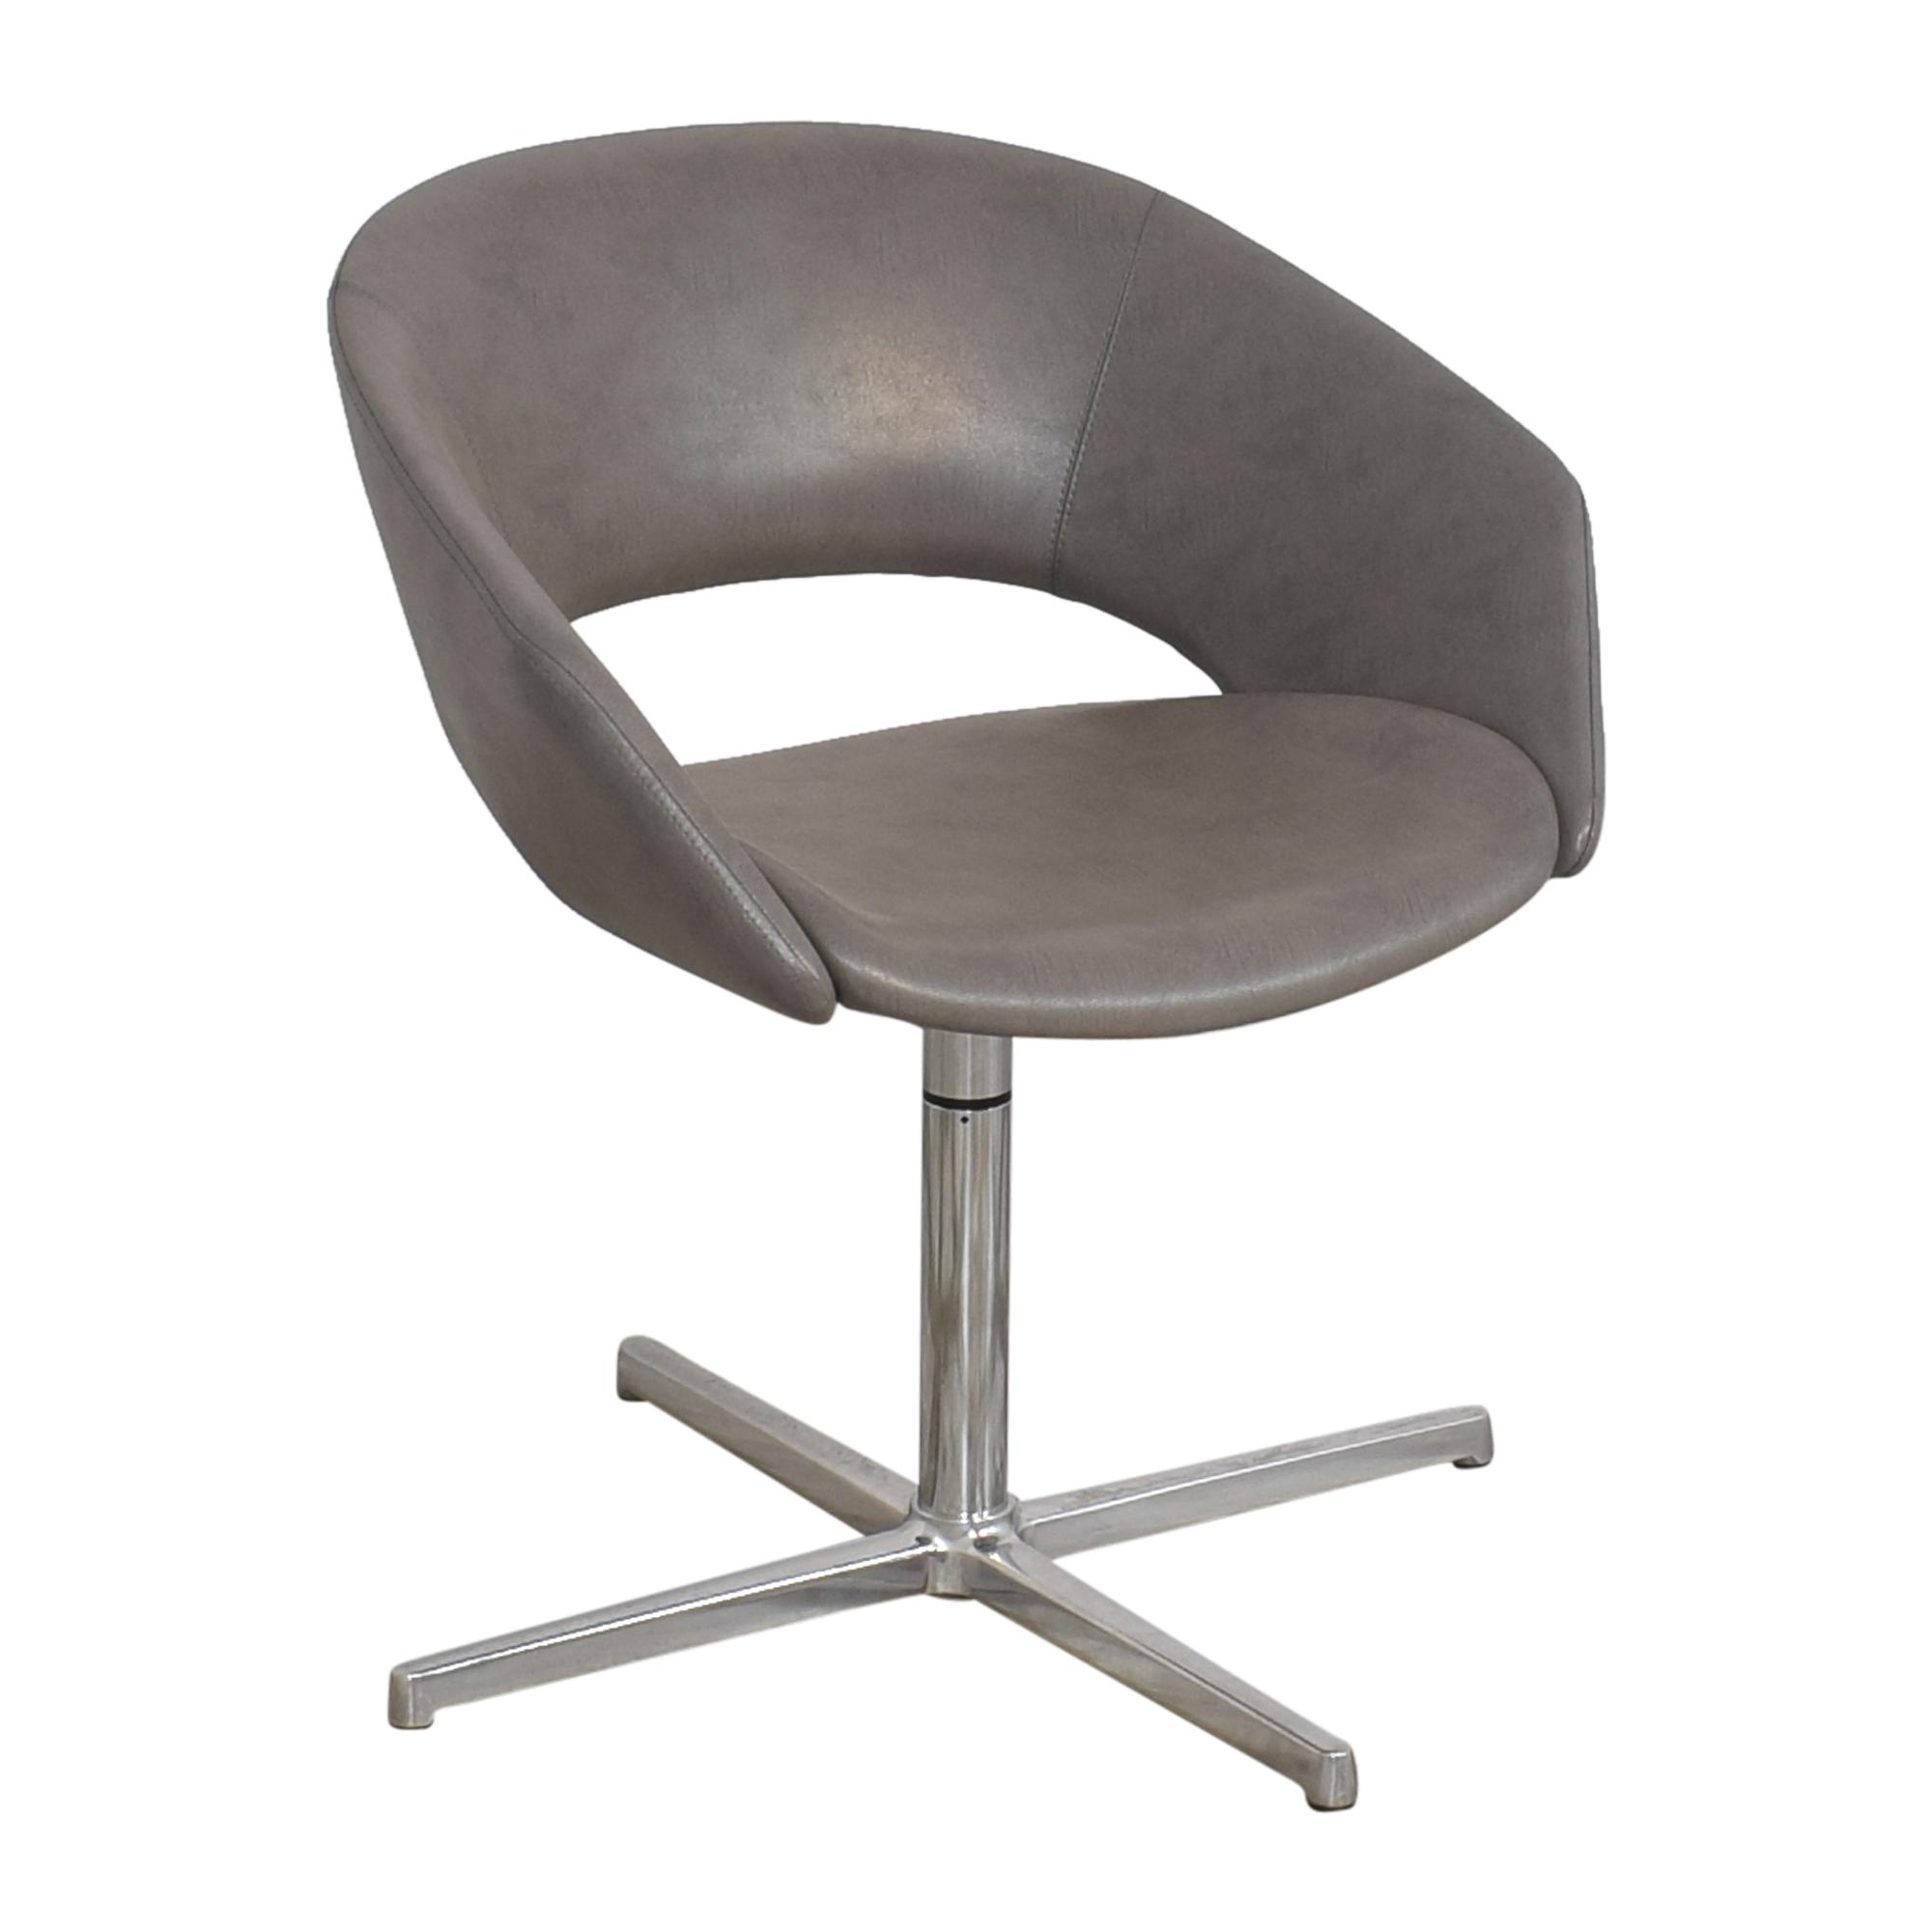 Leland International Leland Mod Pedestal Swivel Chair nyc